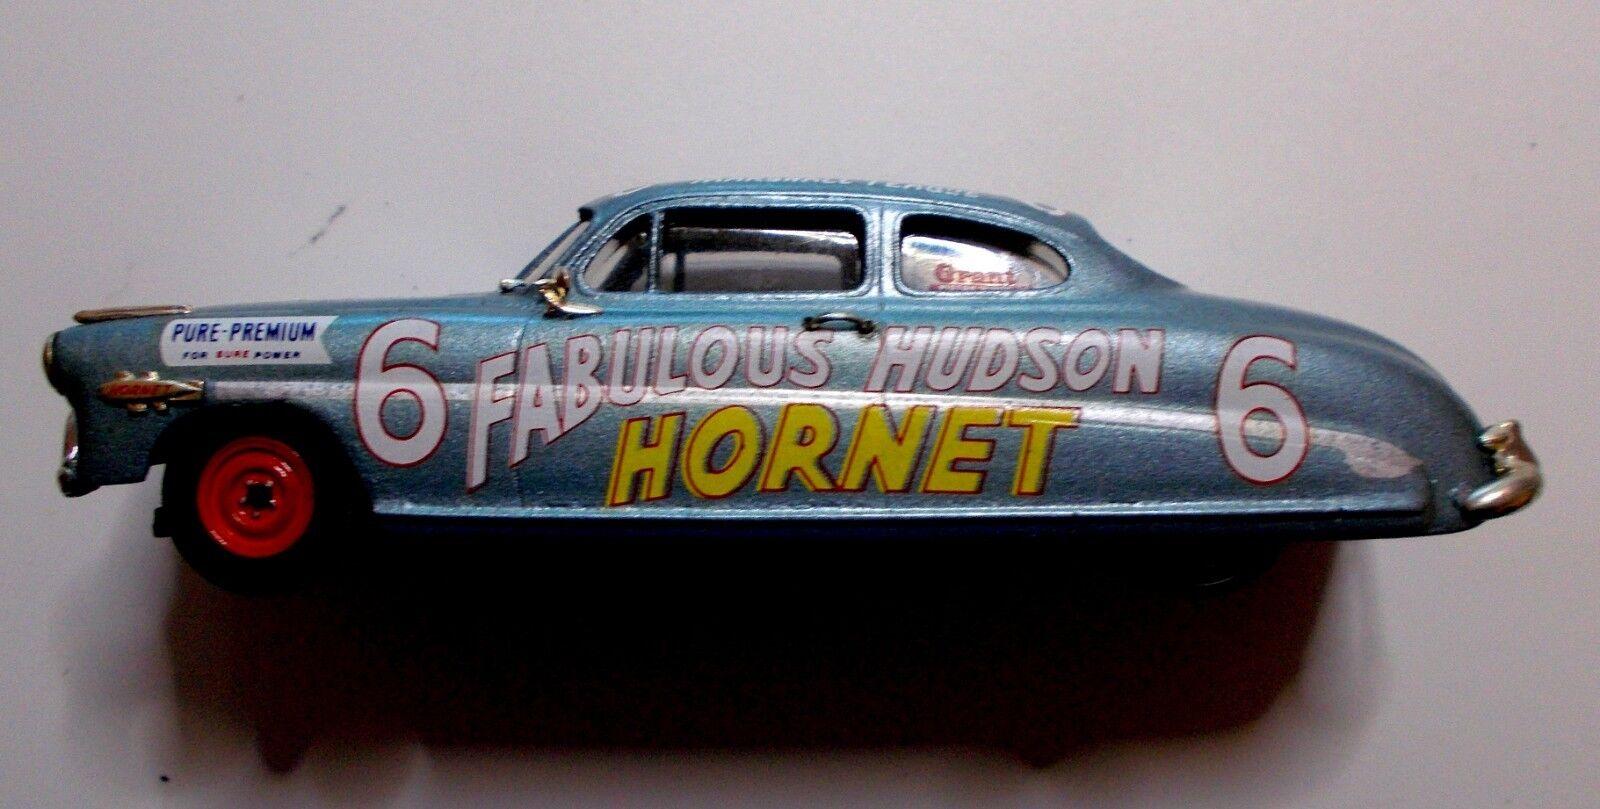 alta calidad y envío rápido 1981 1981 1981 Precison Miniatures 1952 Hudson Hornet Diecast Coche. Marshall Teague  6.  excelentes precios